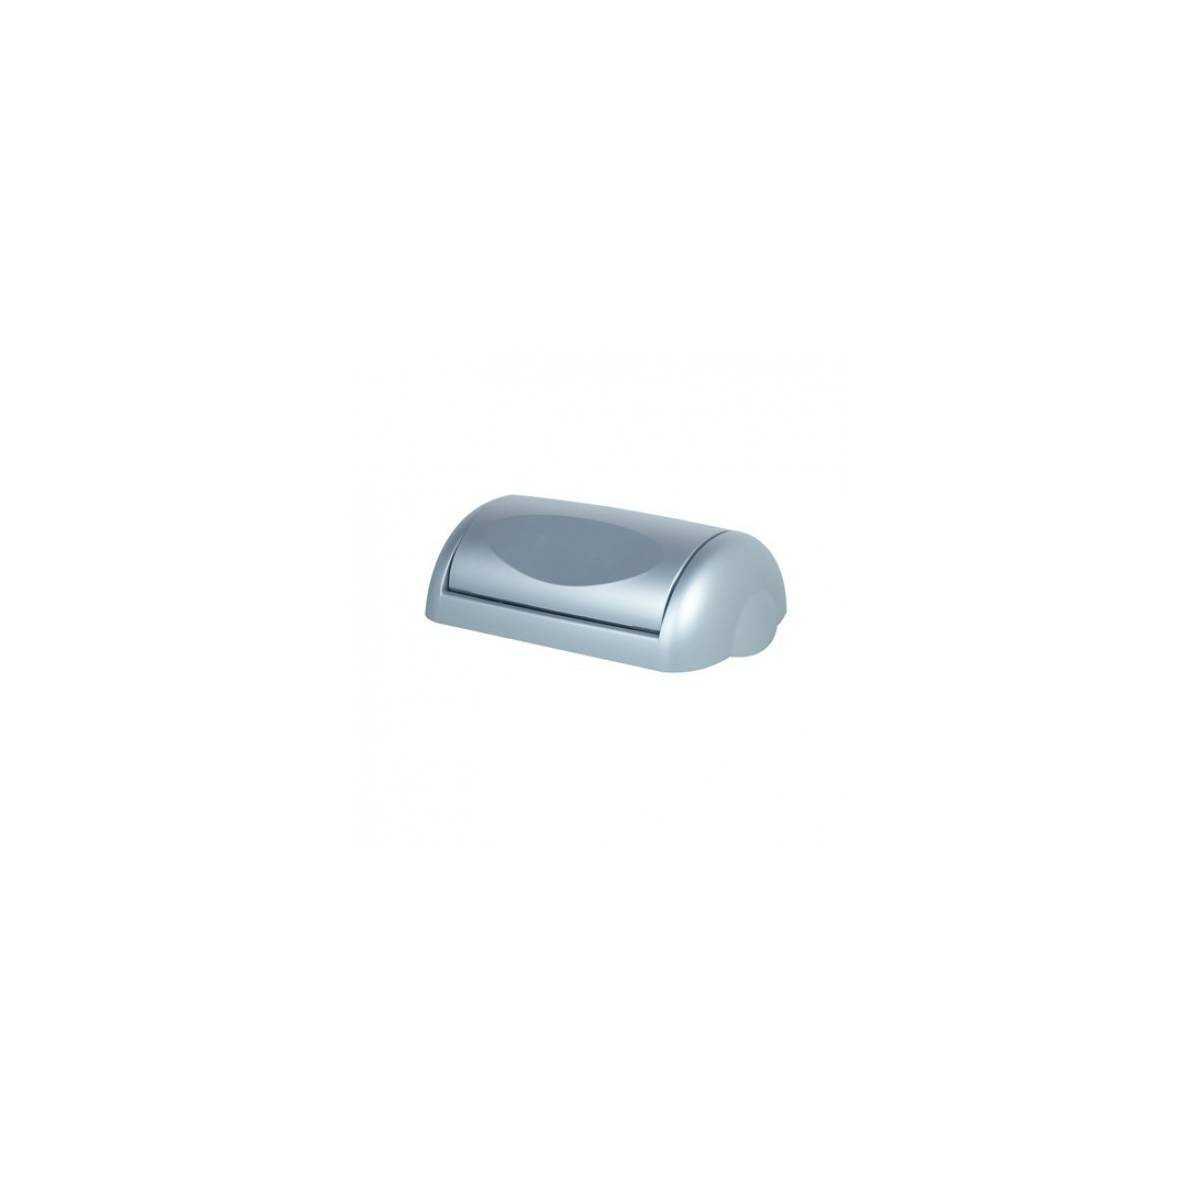 Крышка для урны 23л арт.742SAT PRESTIGE (746SAT) 746SAT Mar Plast